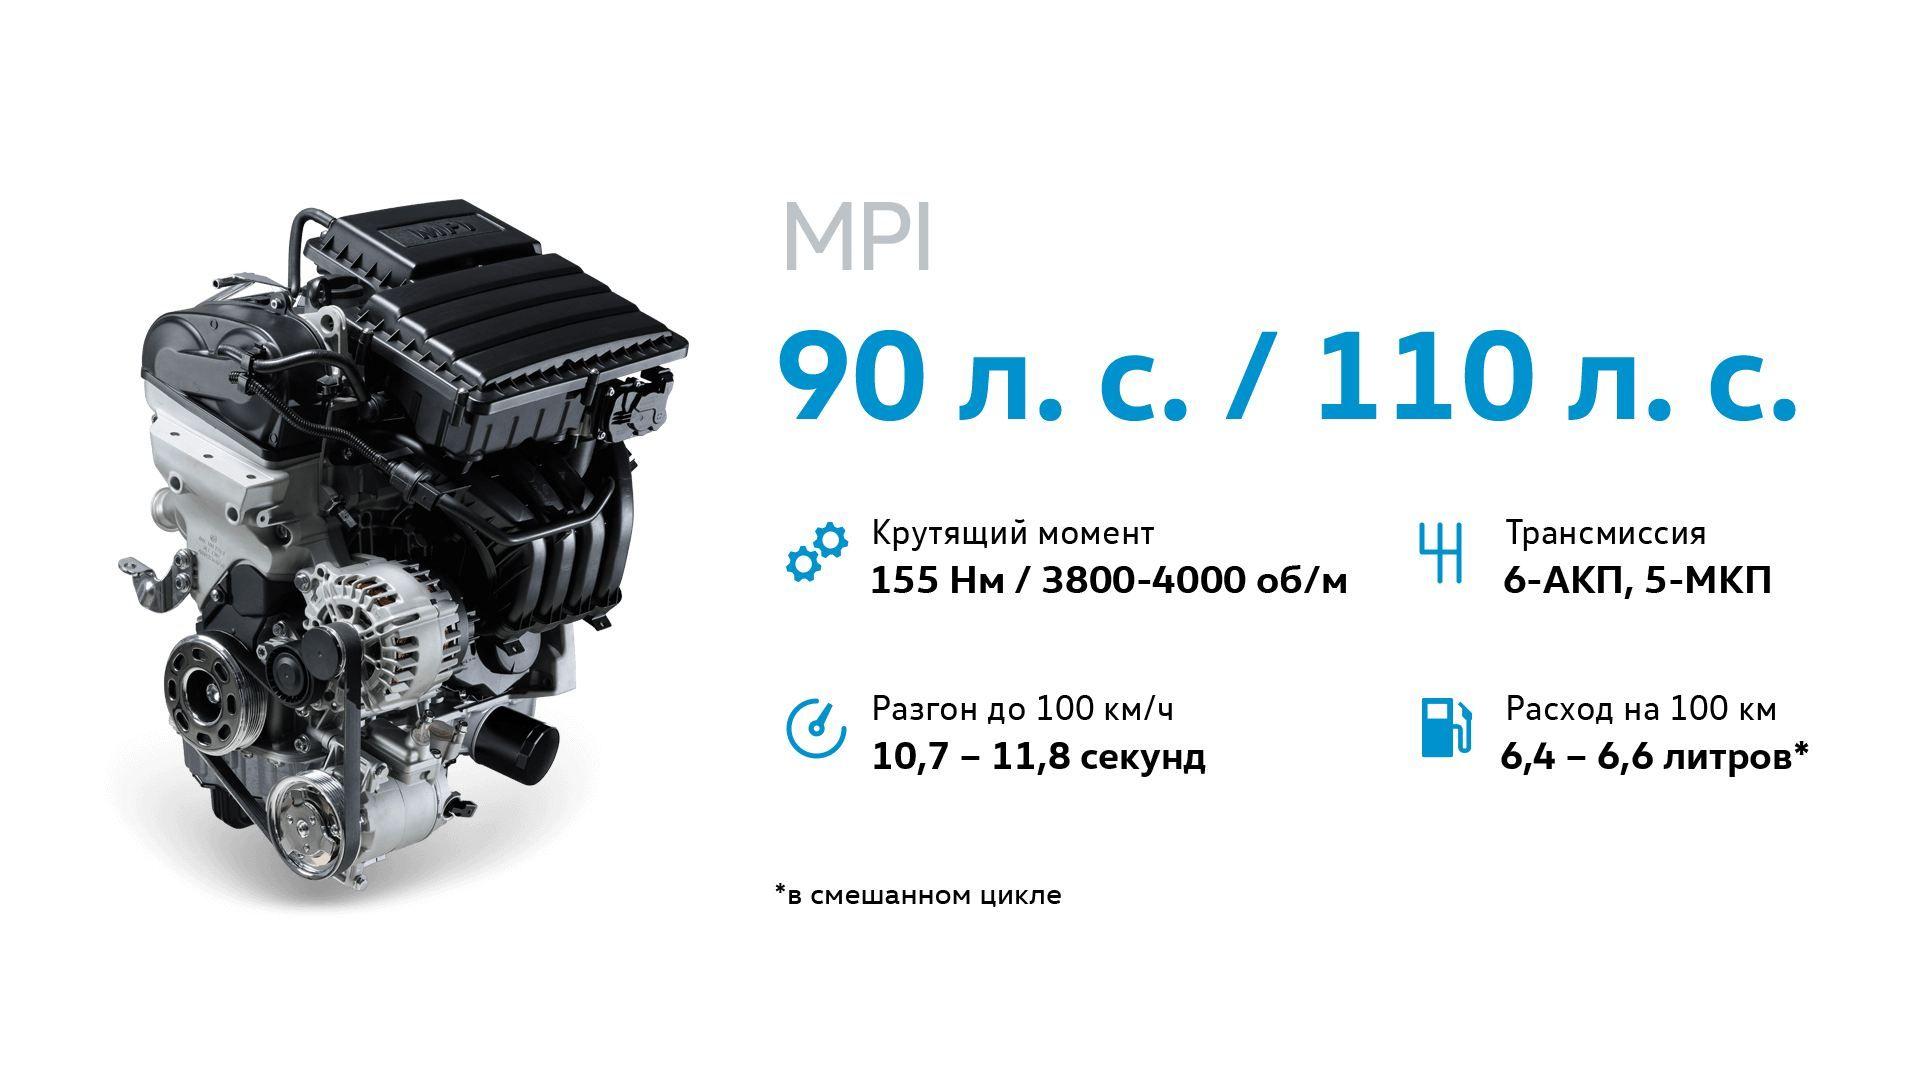 Двигатель Volkswagen MPI 90 л. с. / 110 л. с.